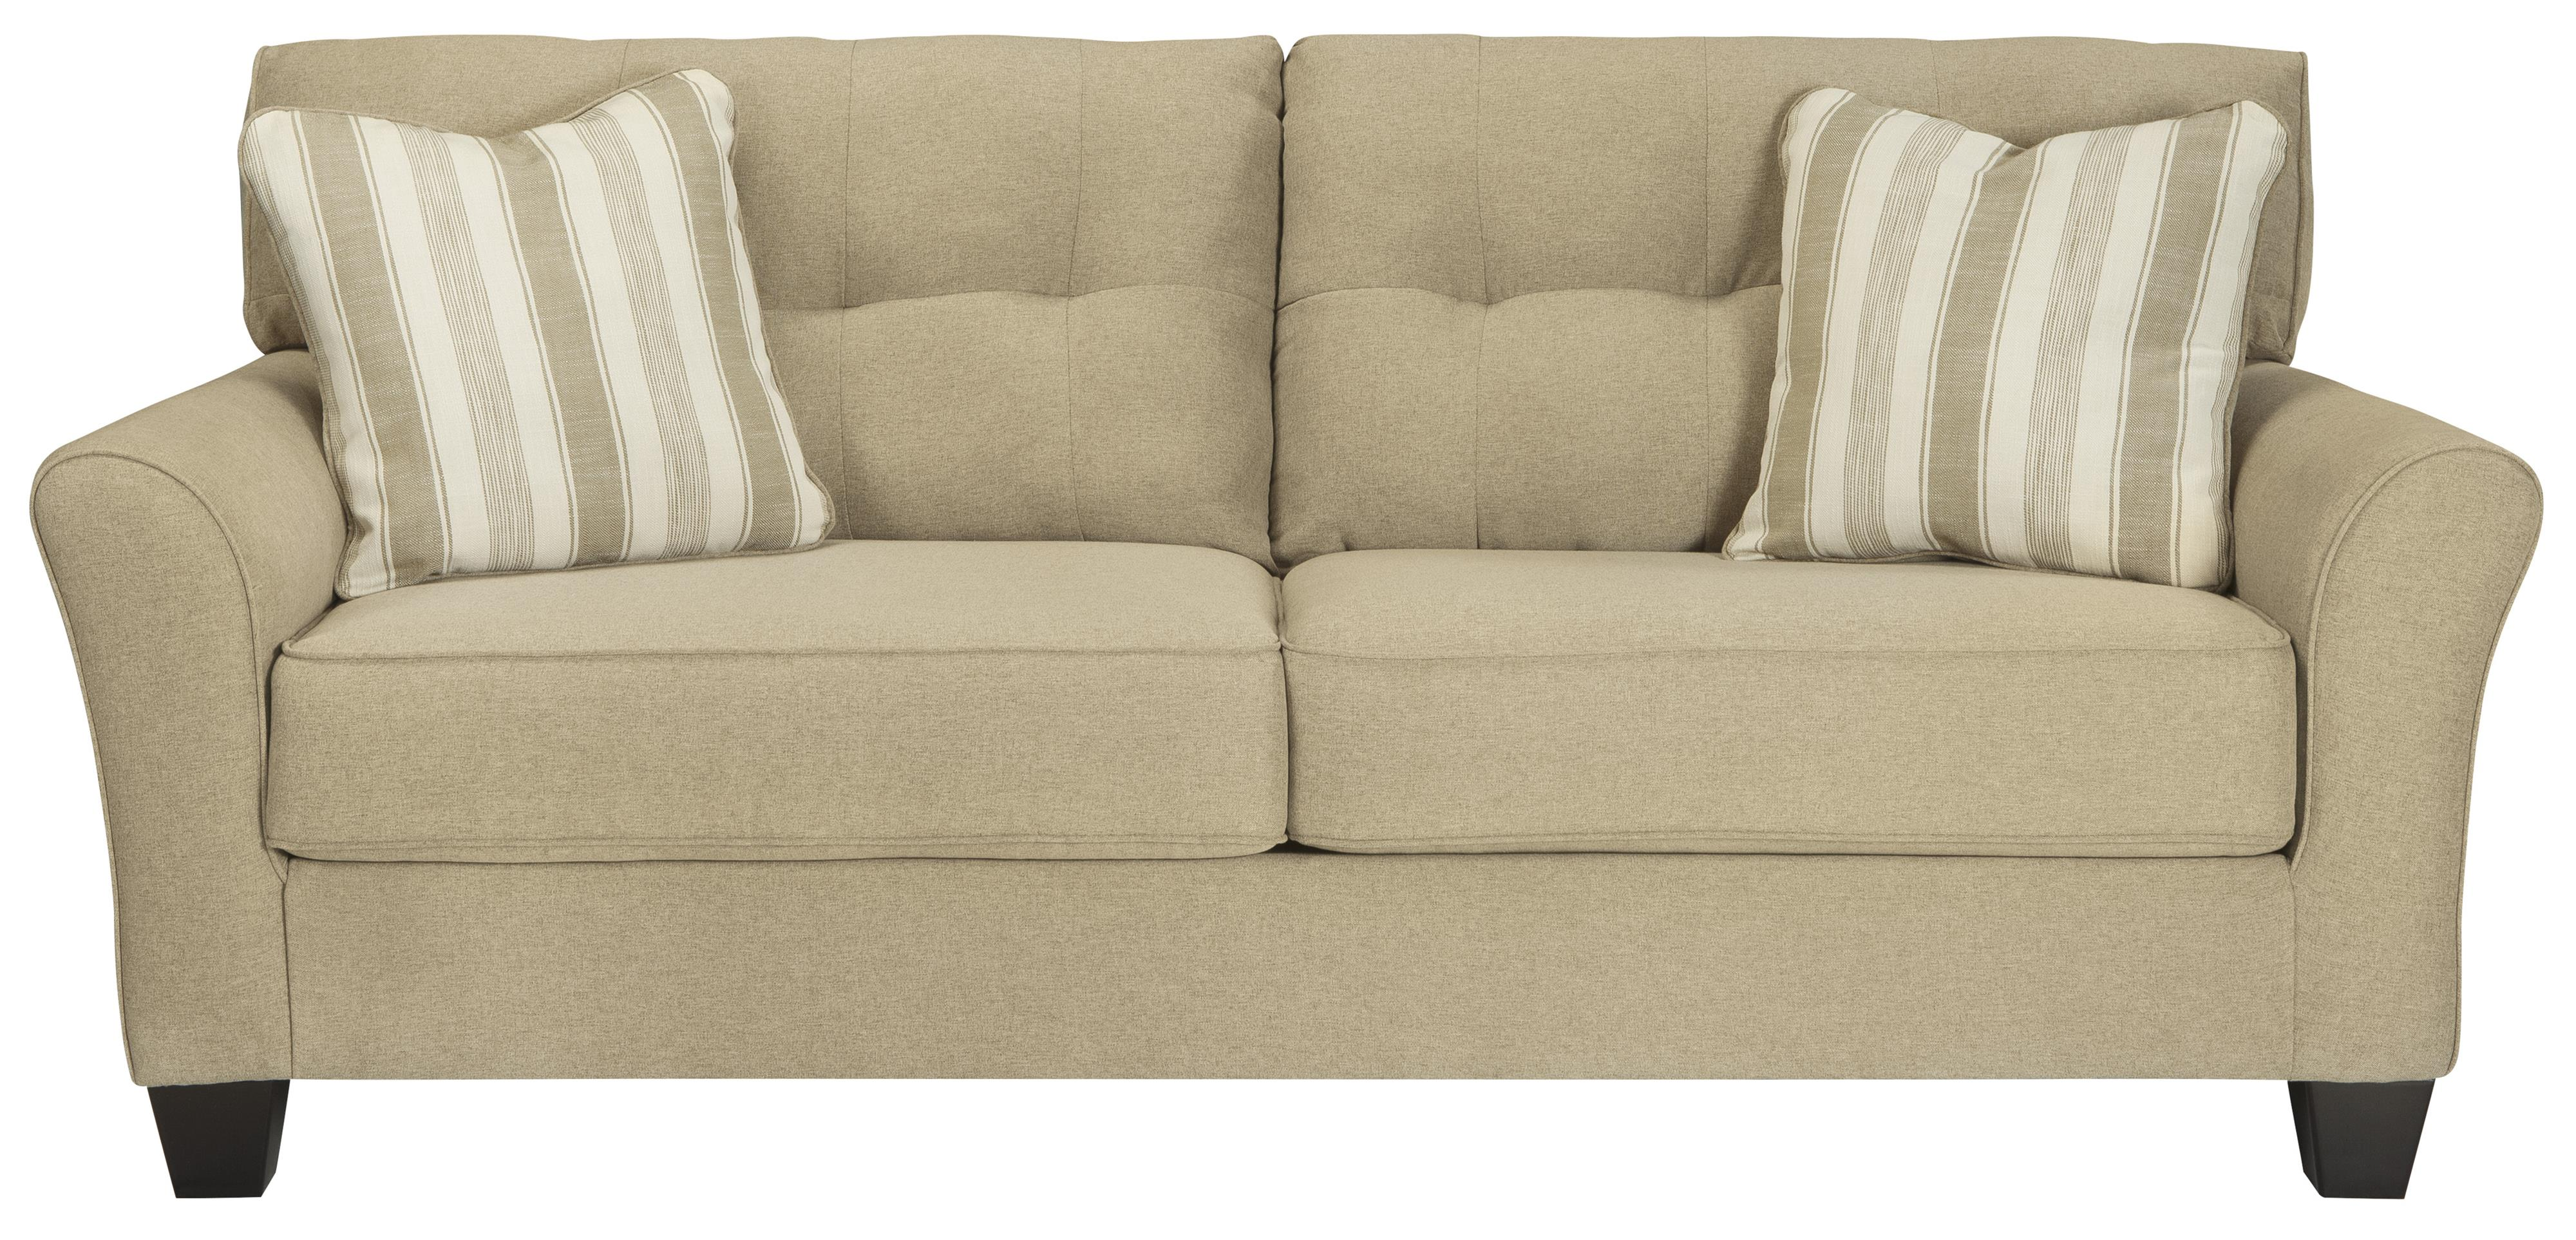 addison sofa ashley furniture cream leather corner dfs khaki graphics l 2420 green room